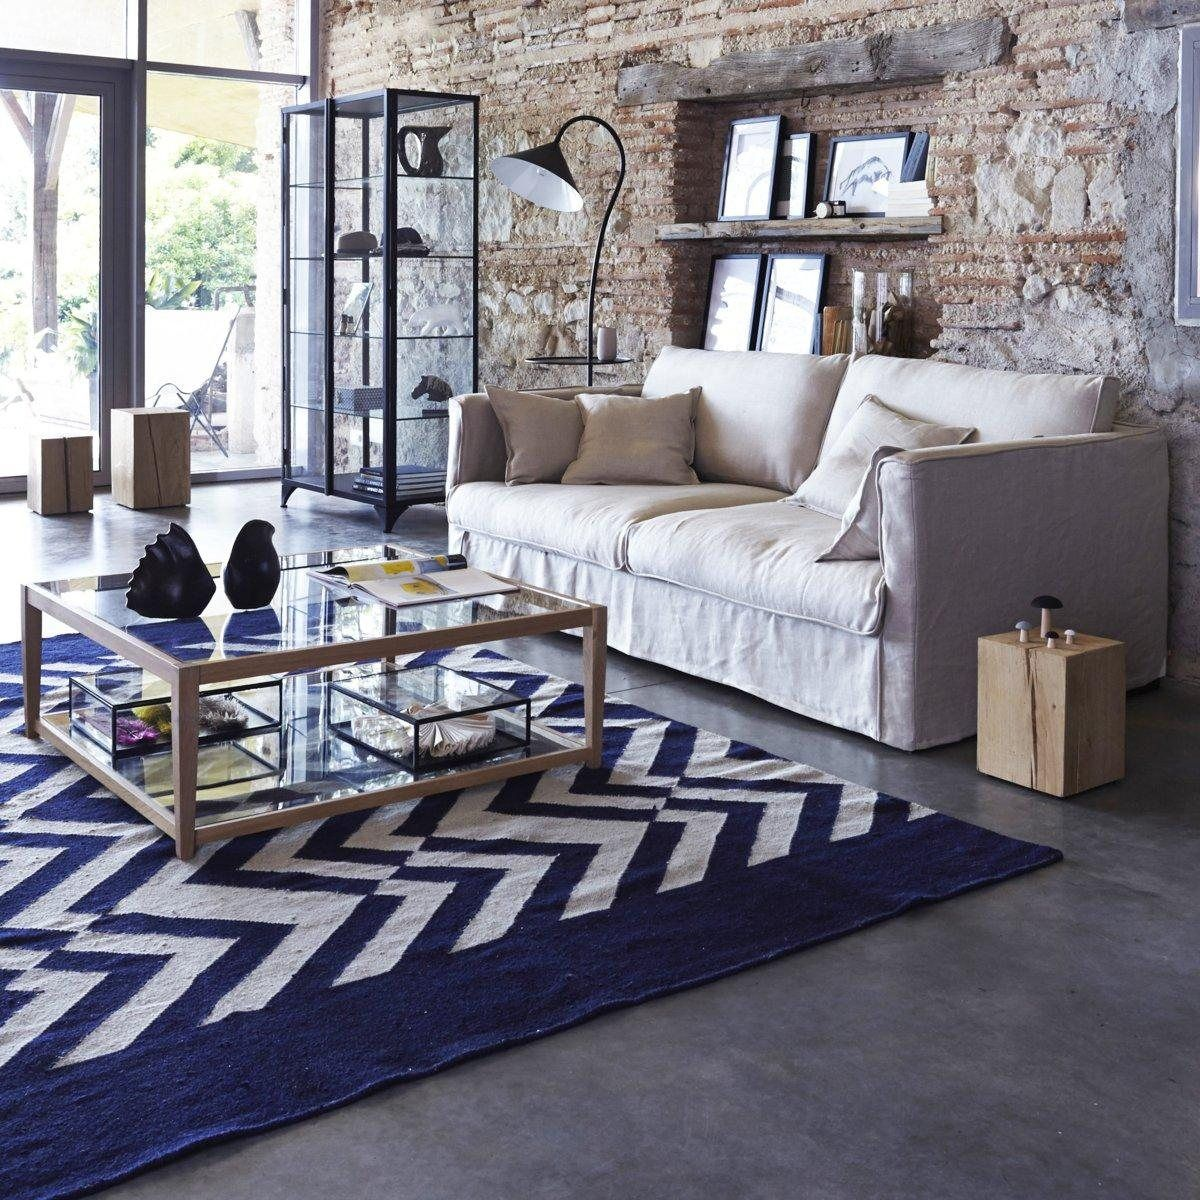 canap convertible camille am pm lin froiss bultex meubles pas cher pinterest canap. Black Bedroom Furniture Sets. Home Design Ideas